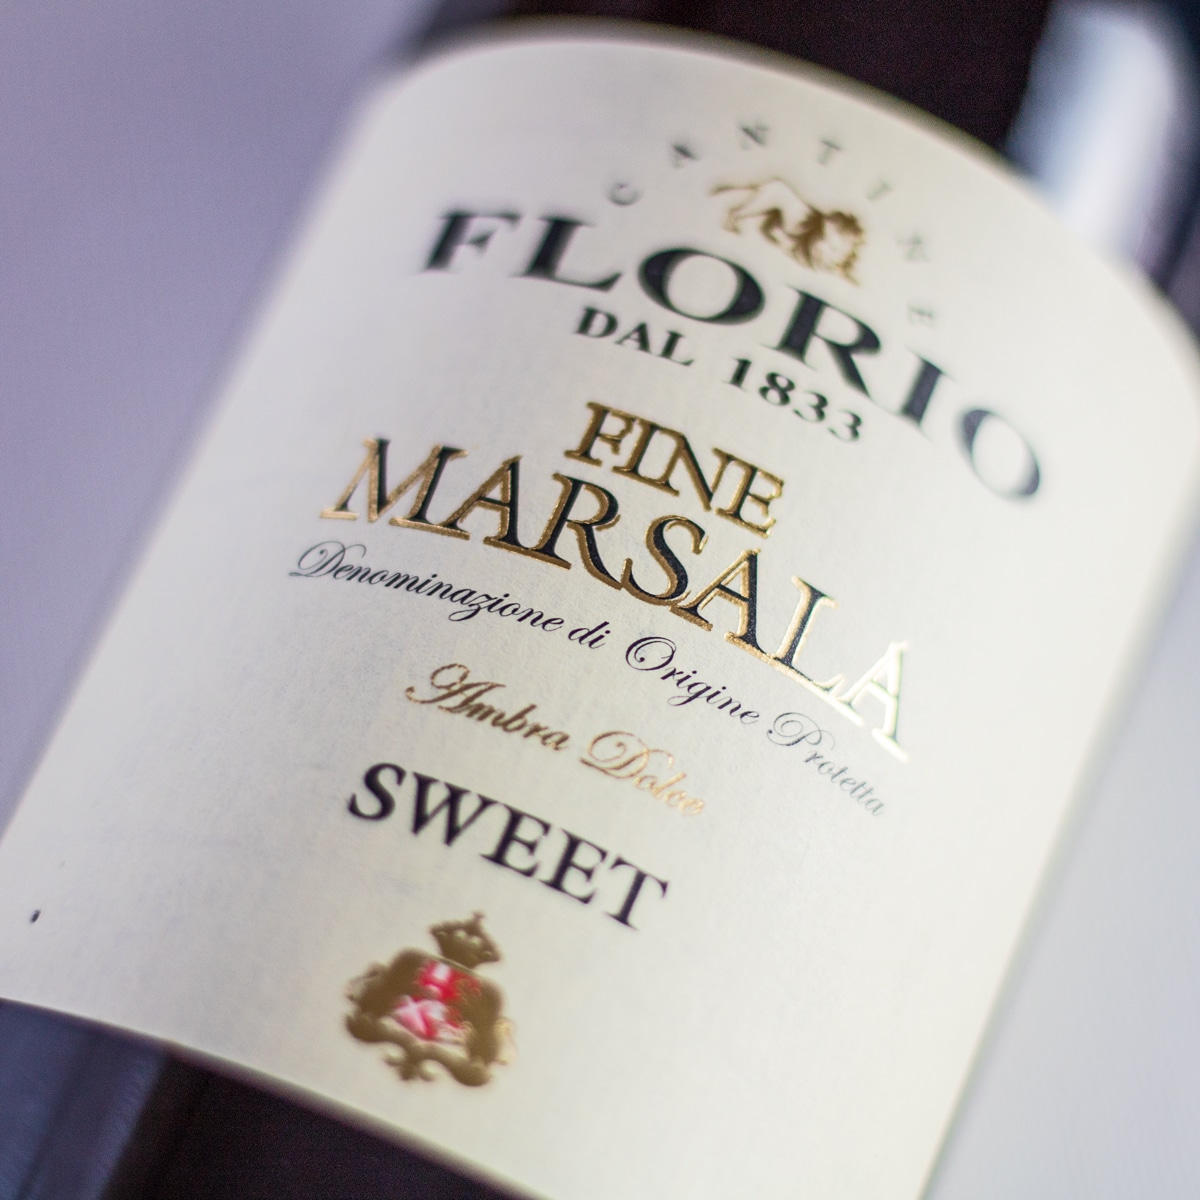 Stort firkantet Marsala Wine Substitute -billede, der viser flasketiket.